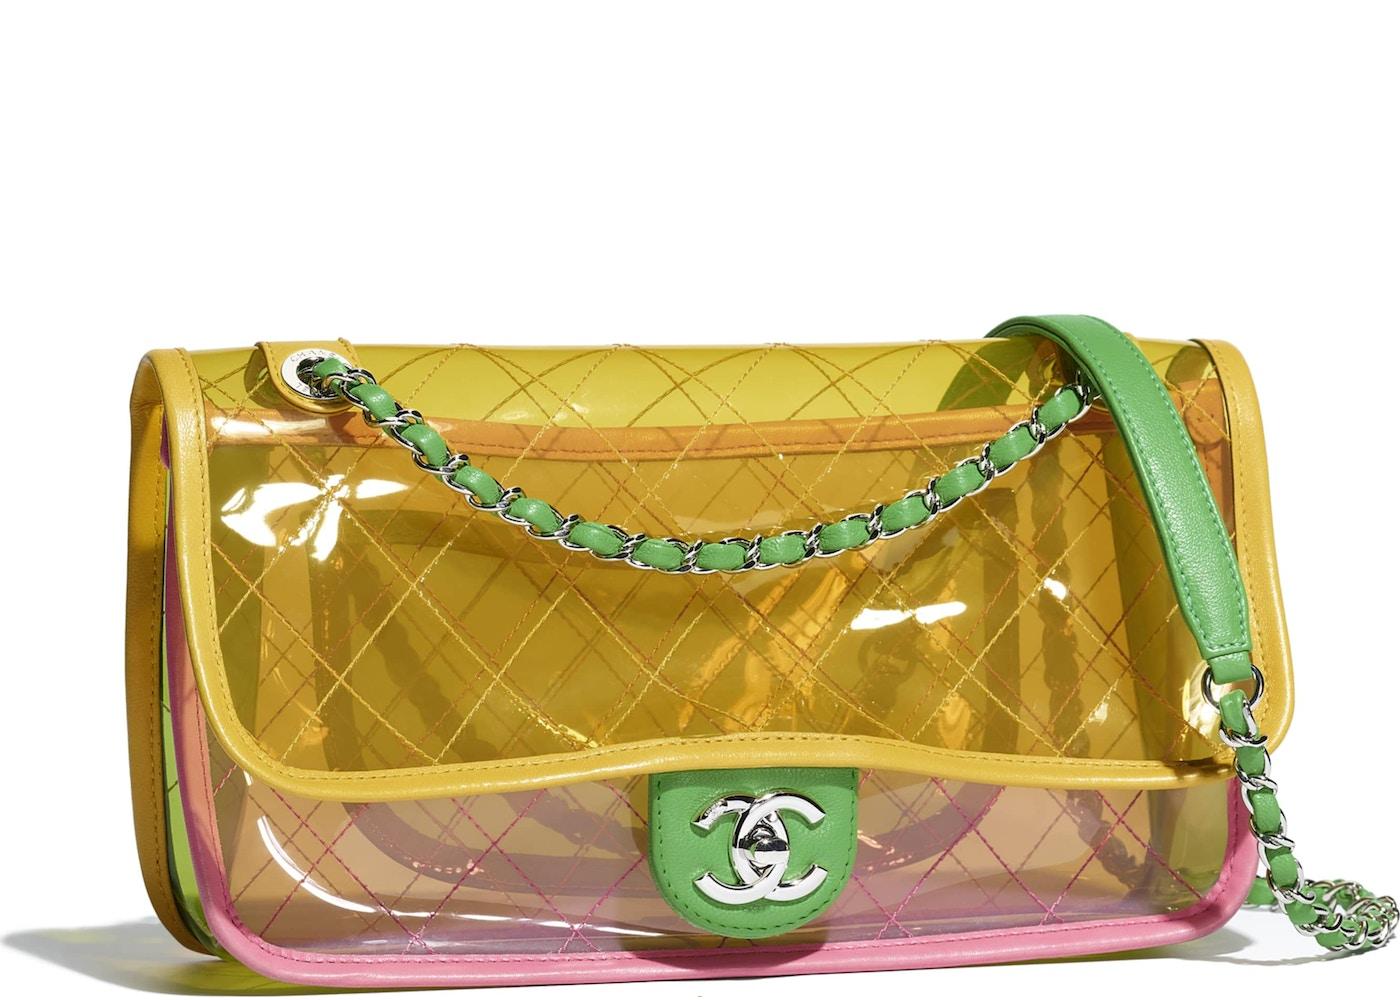 cf257cc82098 Chanel Flap Bag Transparent Pink Yellow. Transparent Pink Yellow